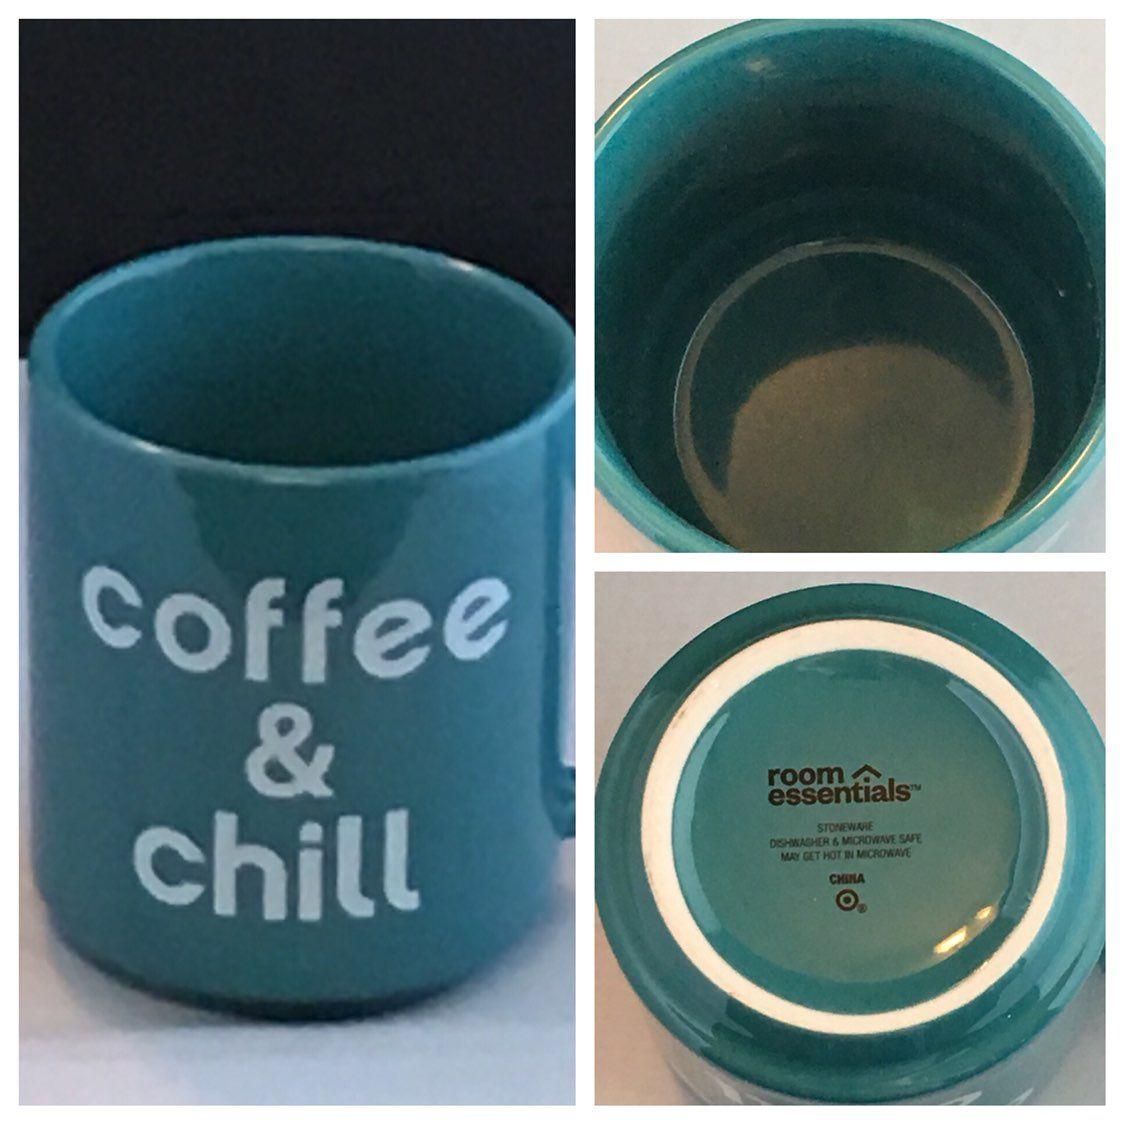 Coffee Mug Till Green Coffee Chill Mug - Mercari: The Selling App ...